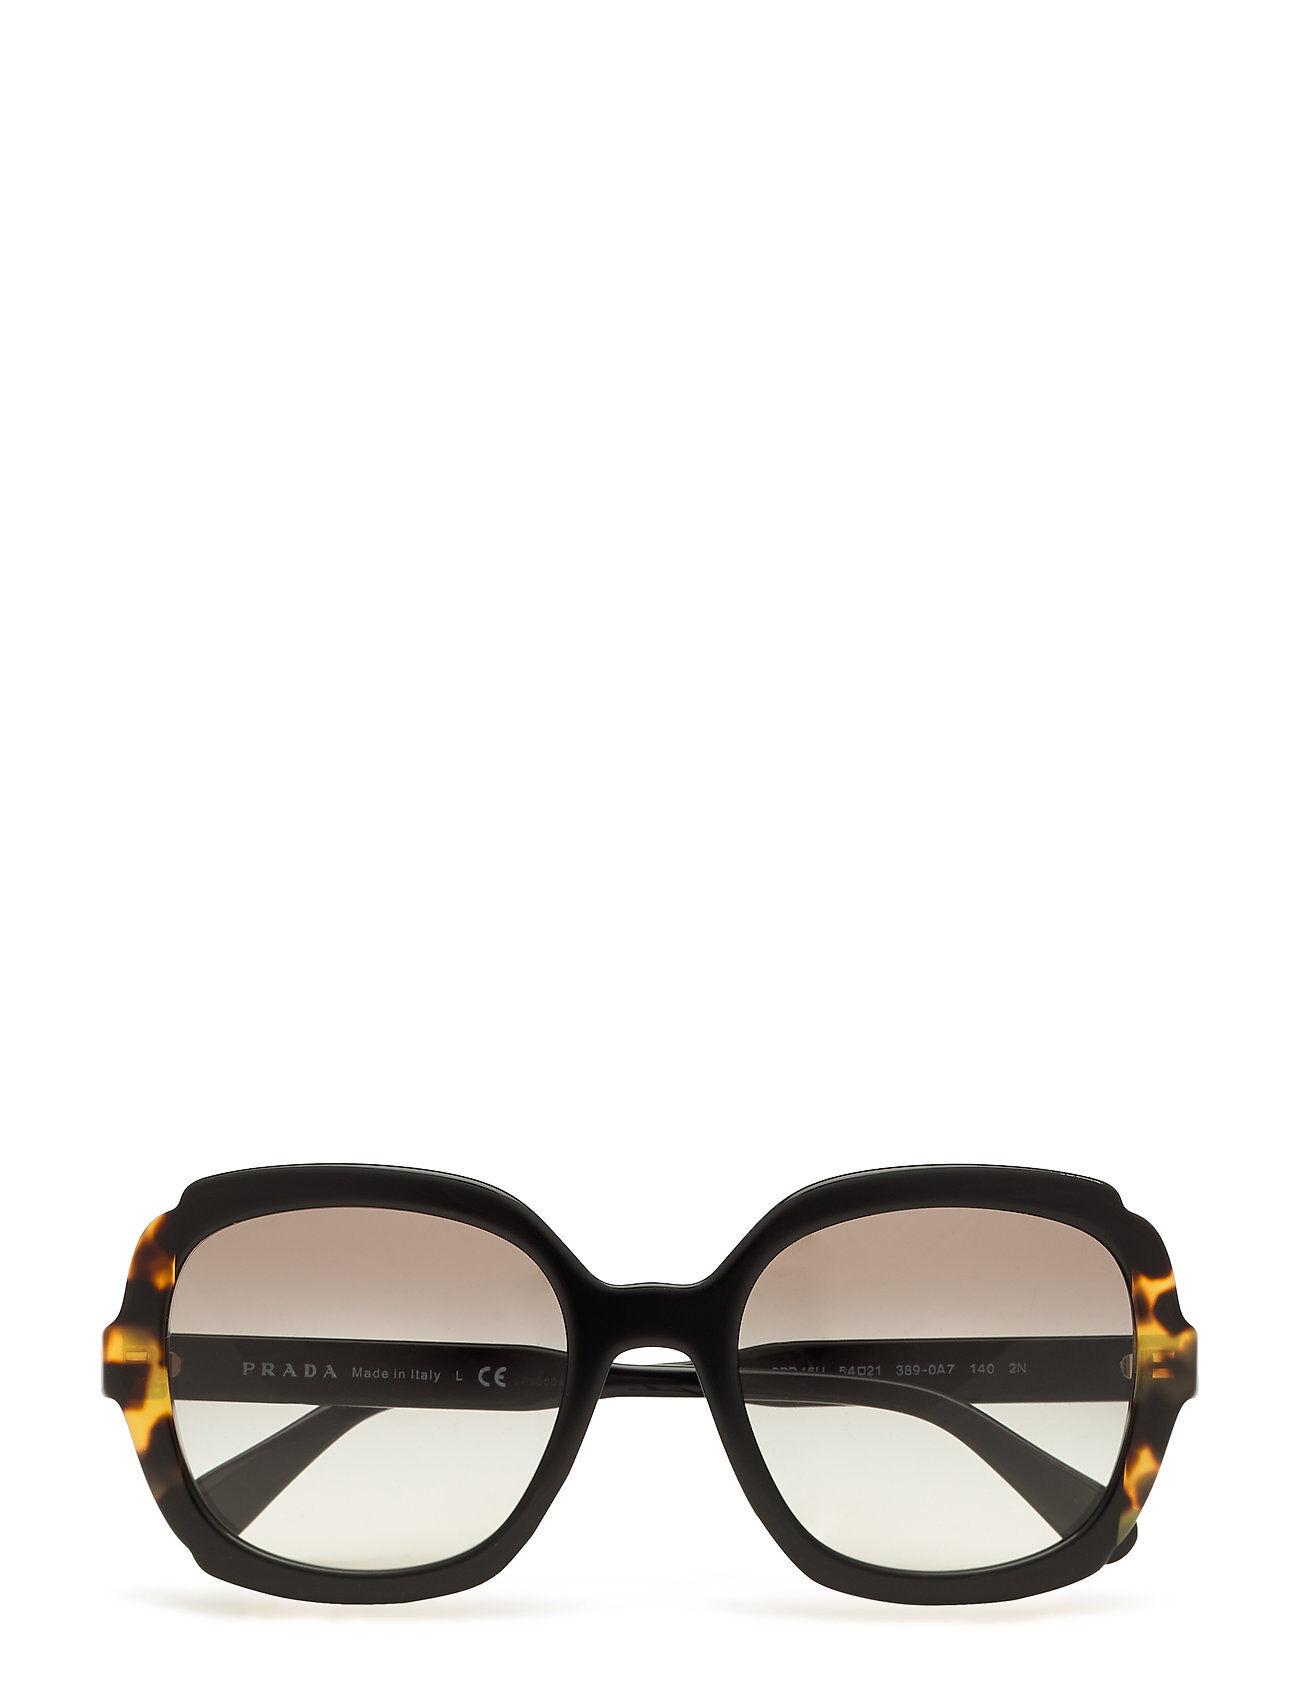 Image of Prada Sunglasses 0pr 16us Wayfarer Aurinkolasit Musta